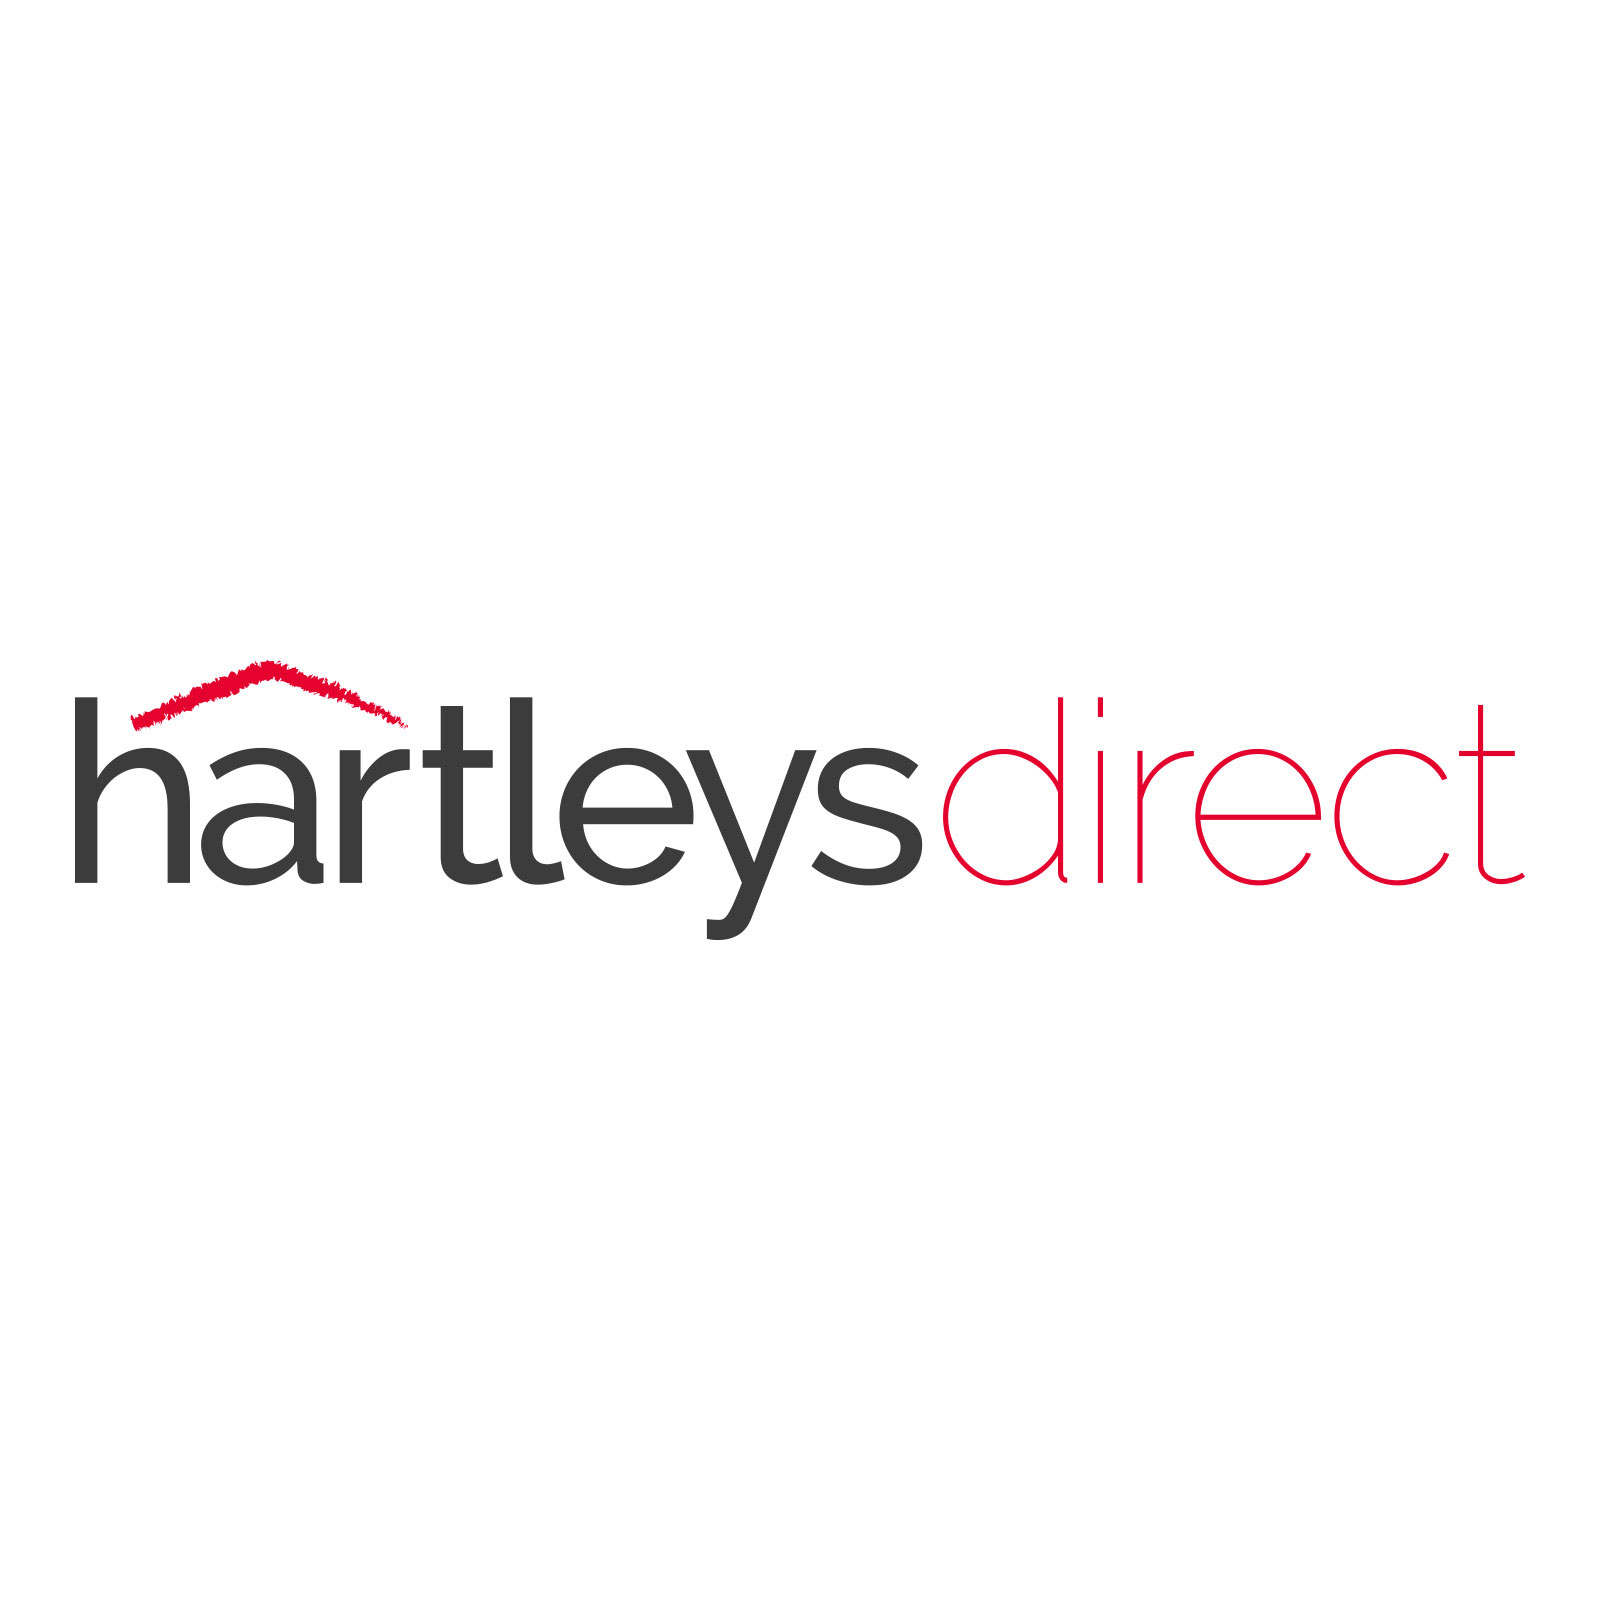 Hartleys-Set-of-4-Black-Bar-Stools-on-White-Background.jpg